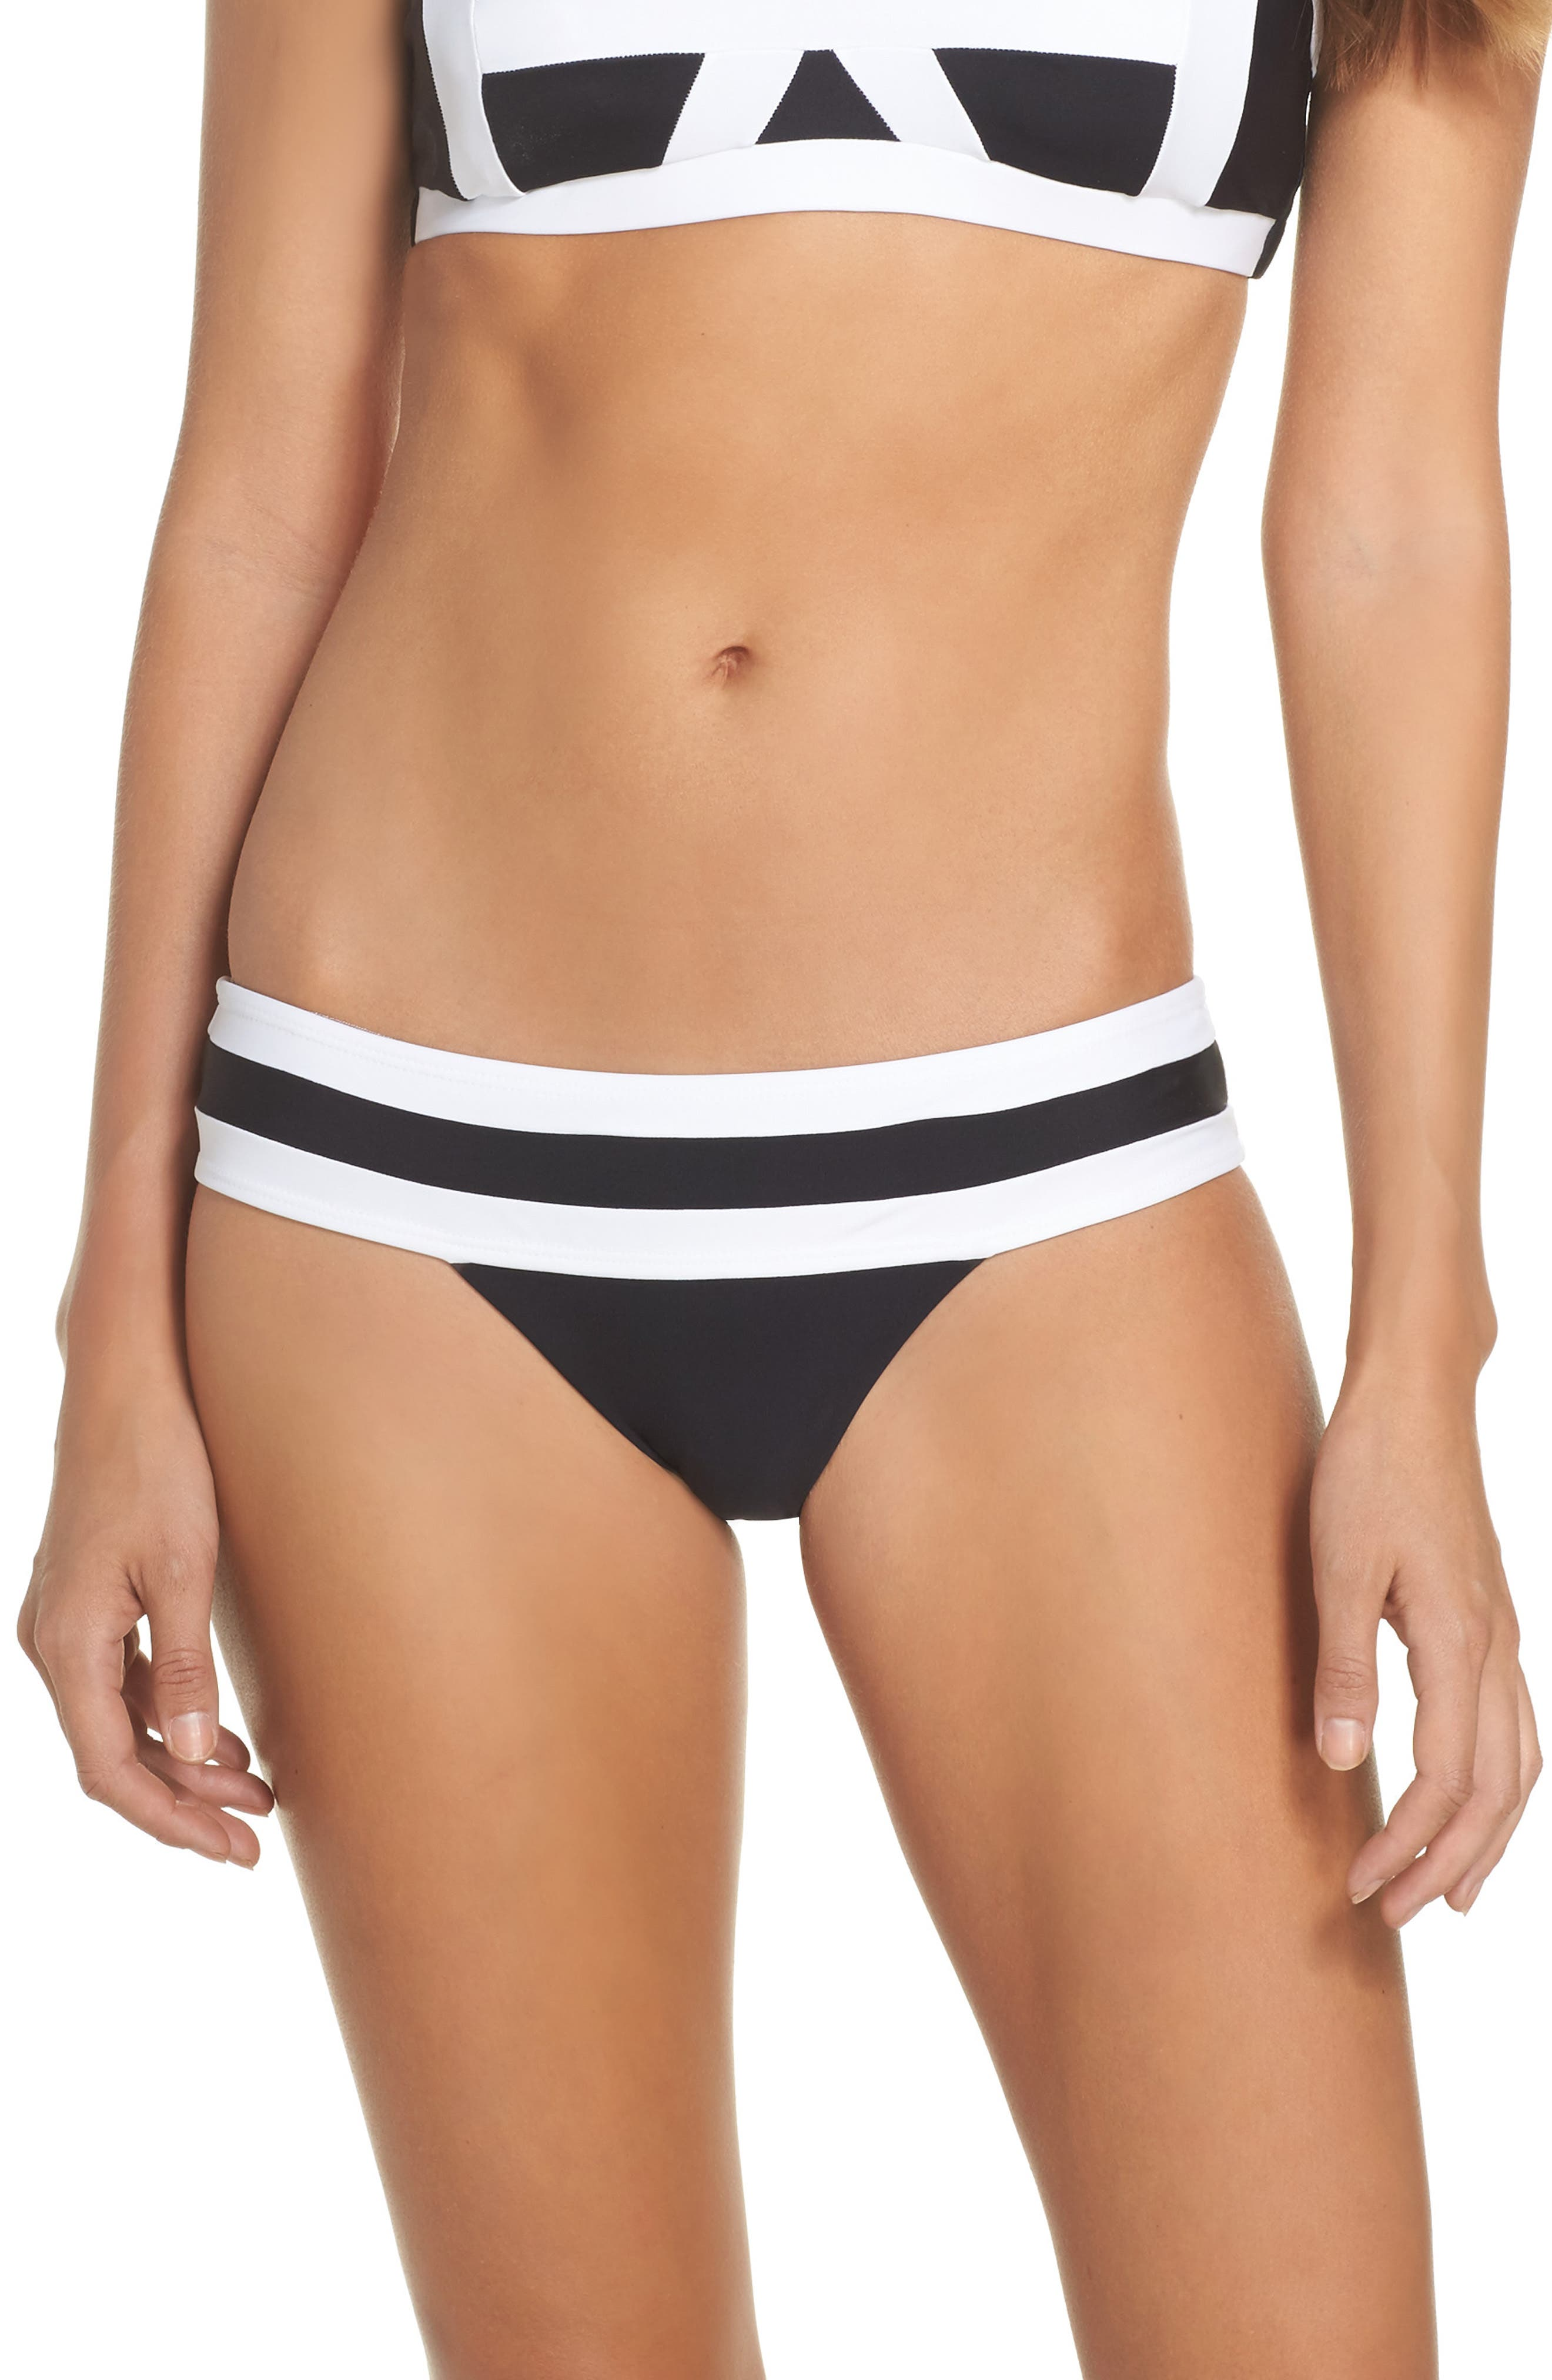 PilyQ Swimwear Bikini Bottoms